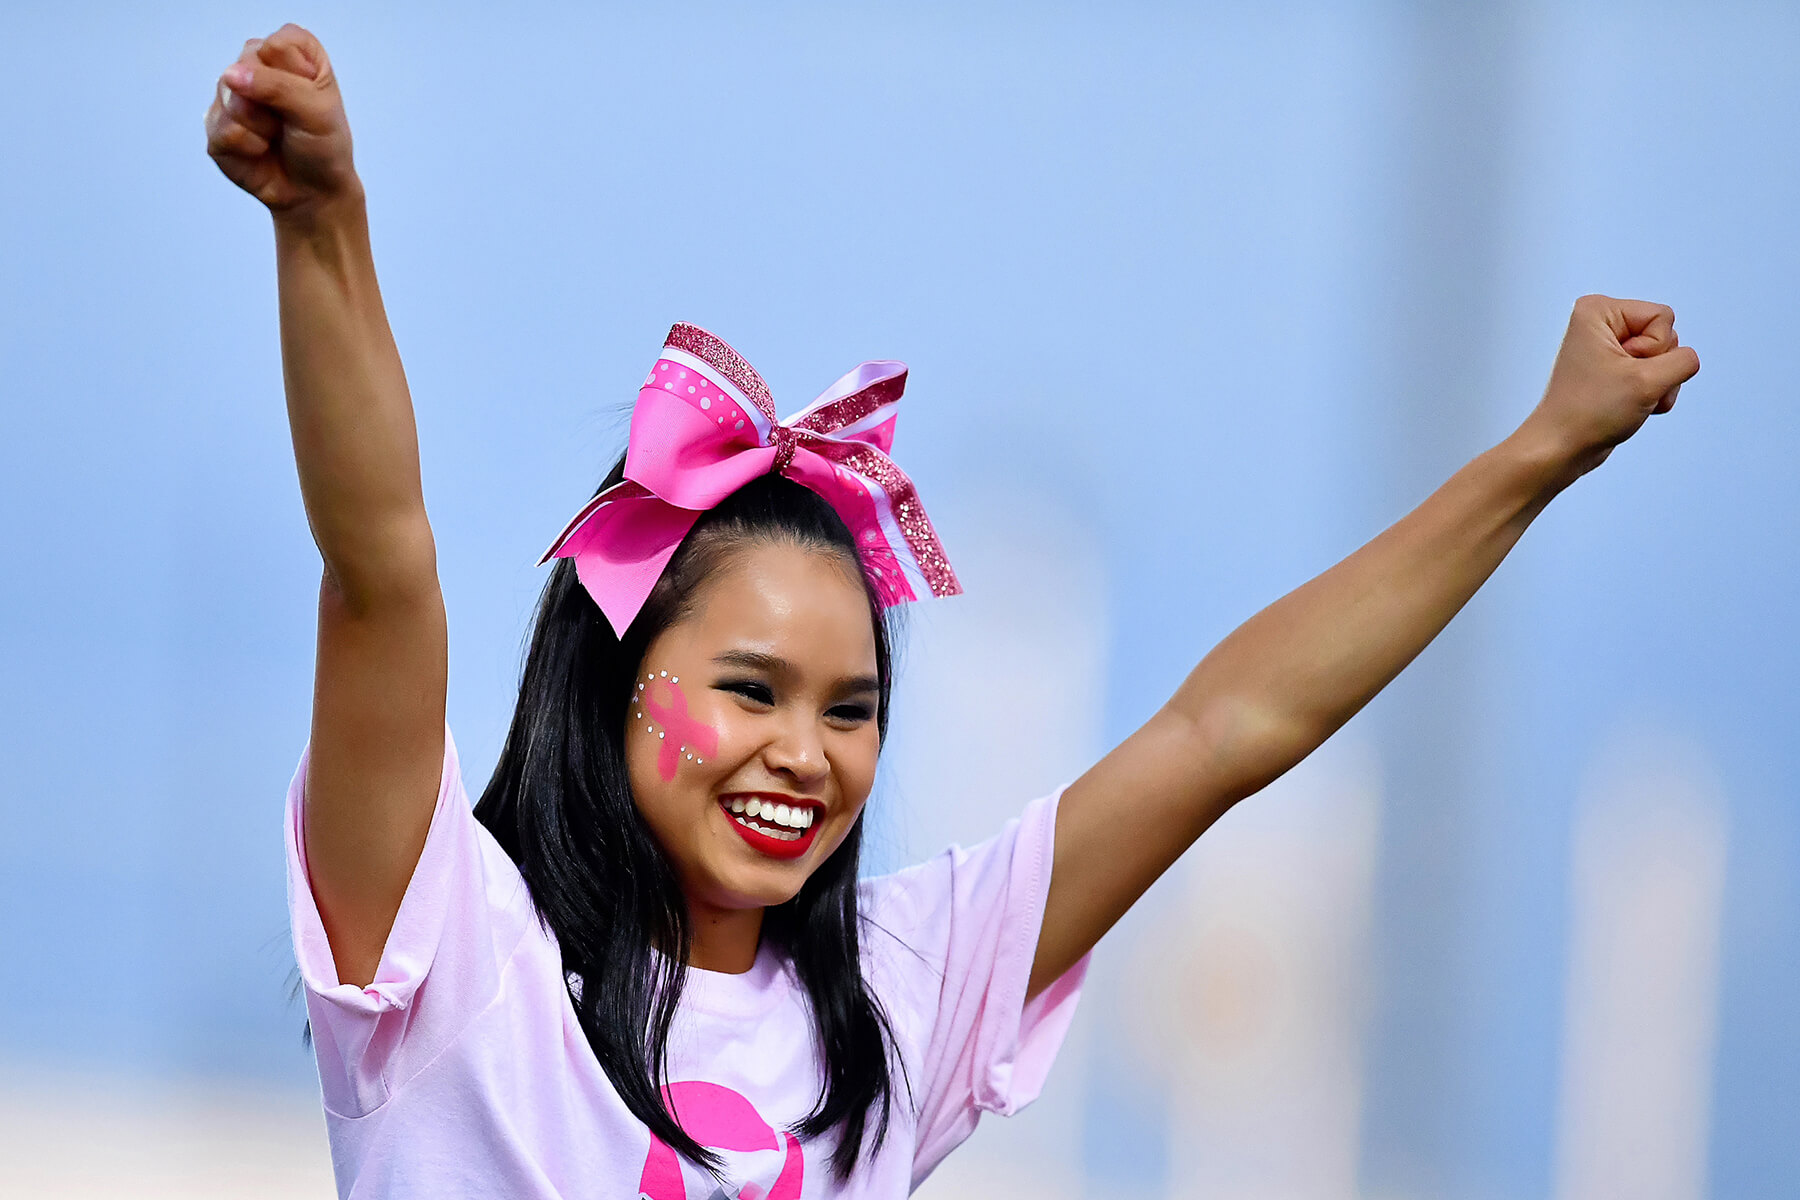 Girl wearing pink ribbon in hair cheering